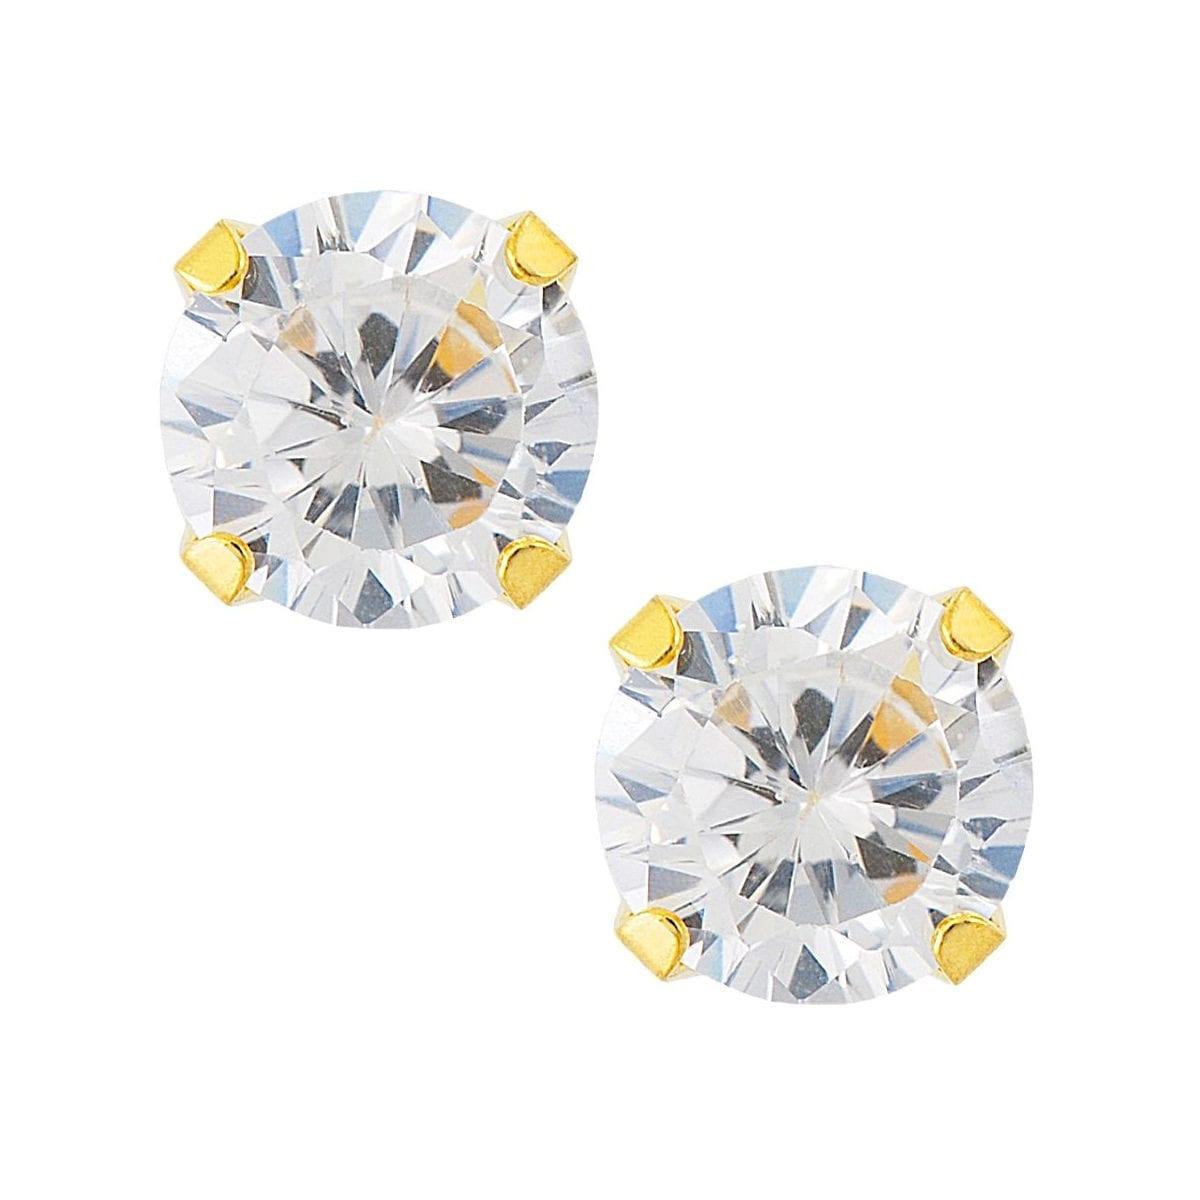 7mm-studex-cubic-zircponia-earrings